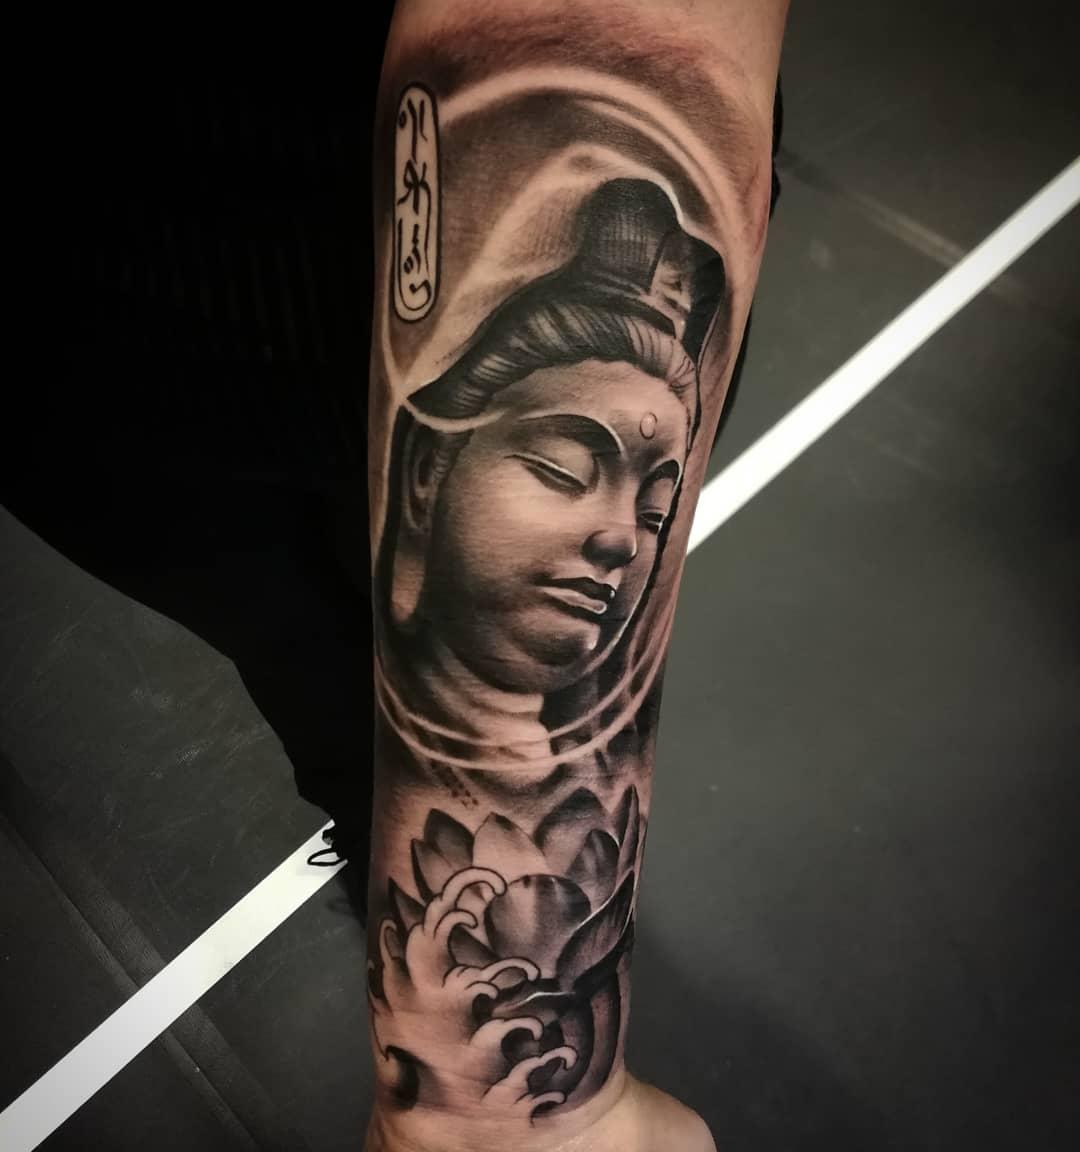 Tattoo by @hoejerart